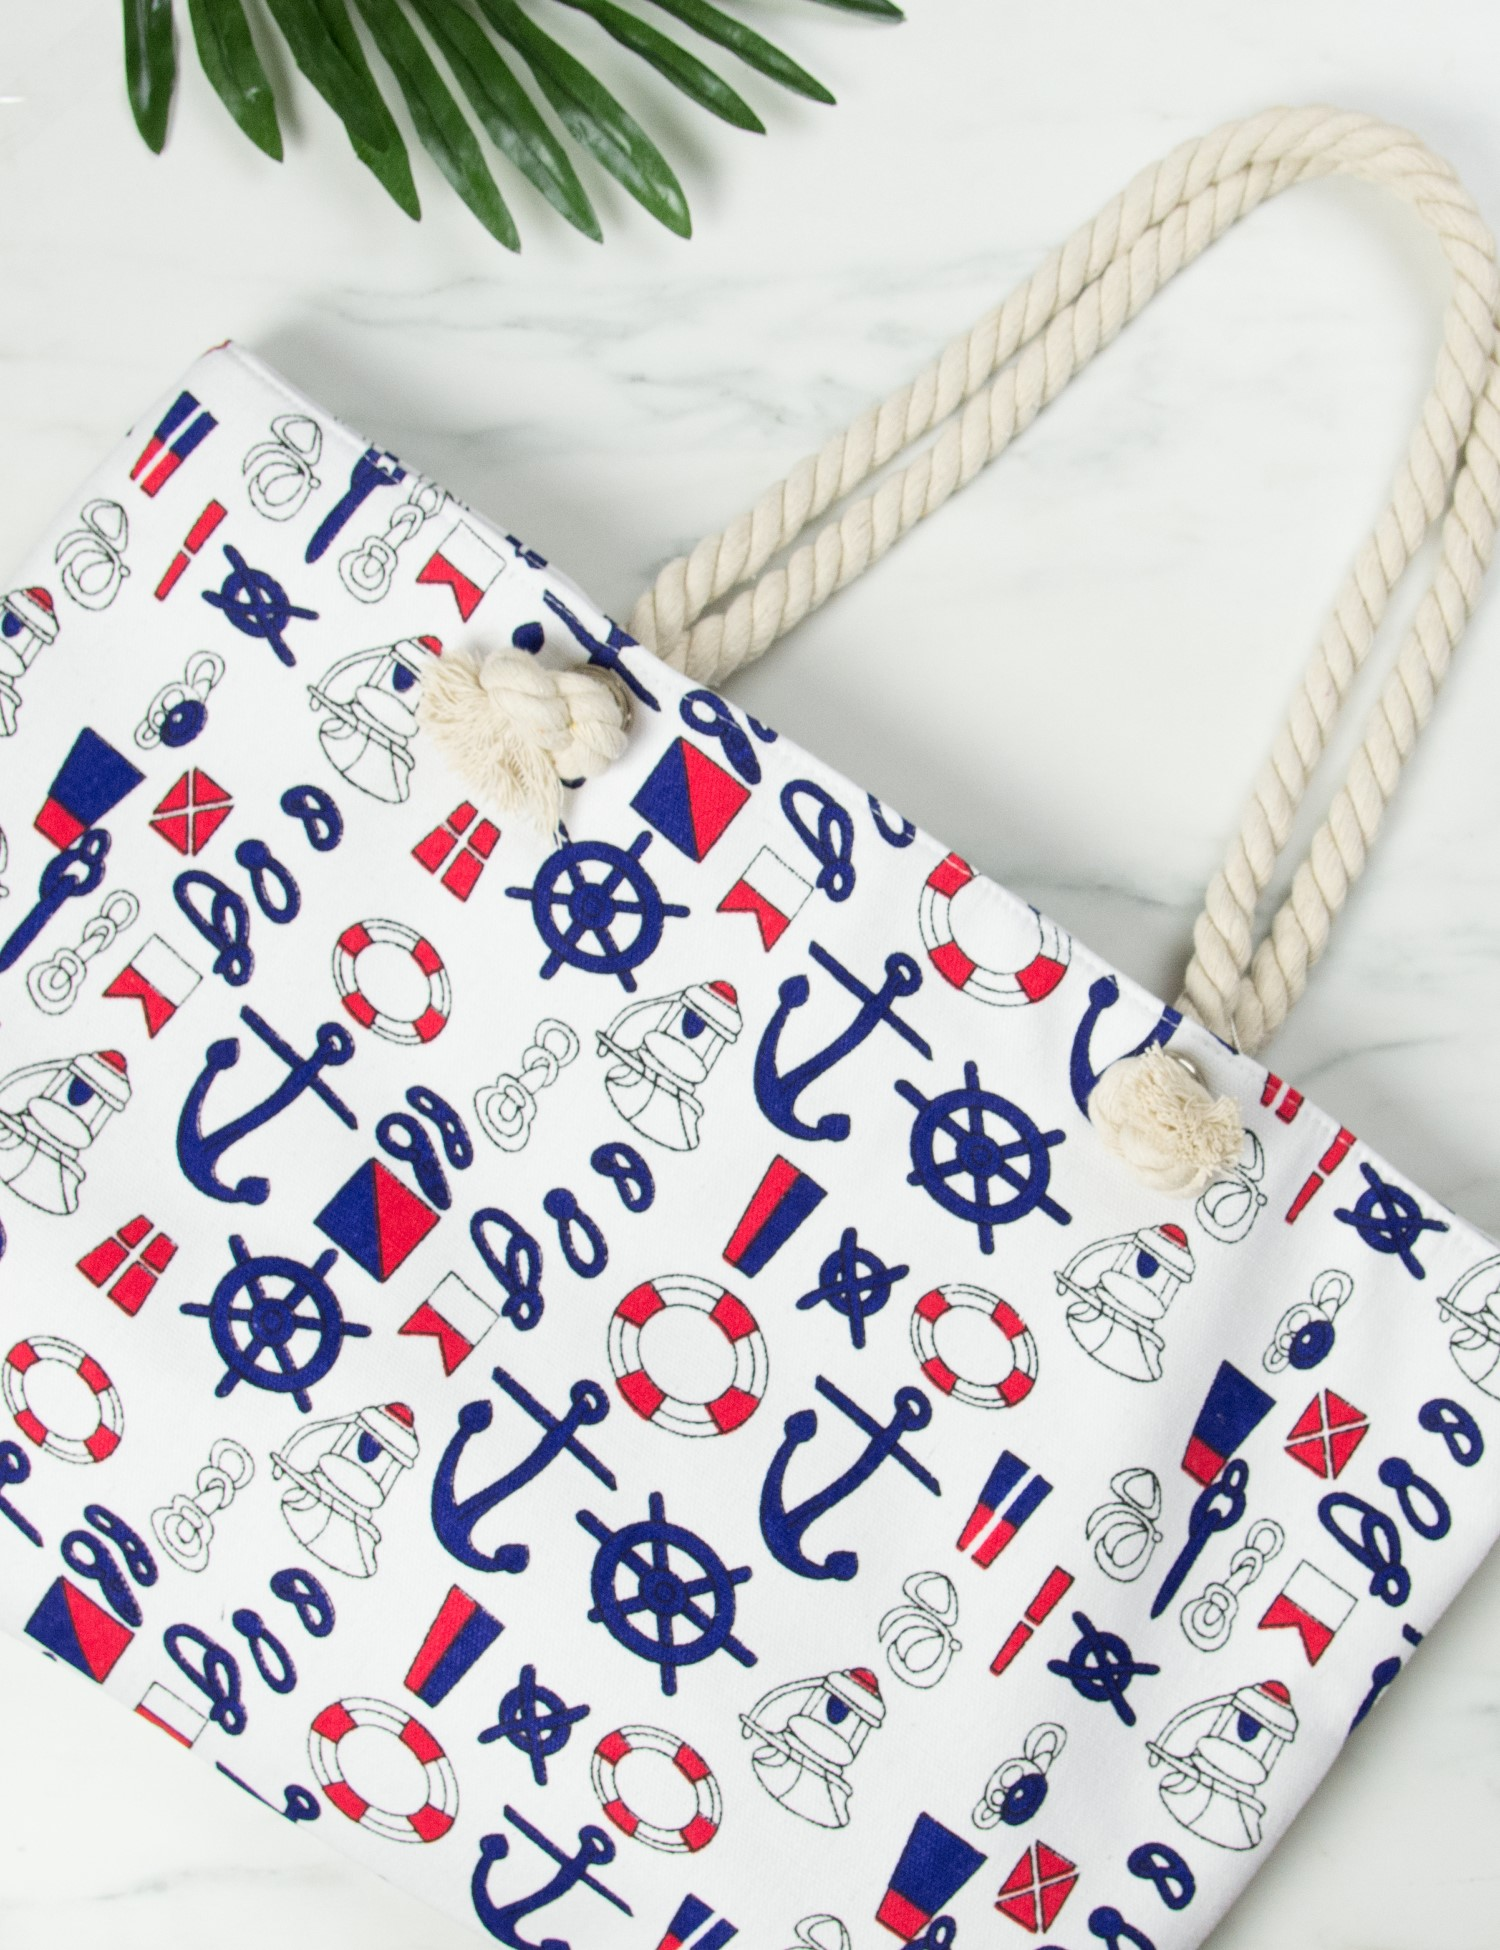 91dfcb1126b Γυναικεία λευκή τσάντα θαλάσσης τετράγωνη με άγκυρες 3045